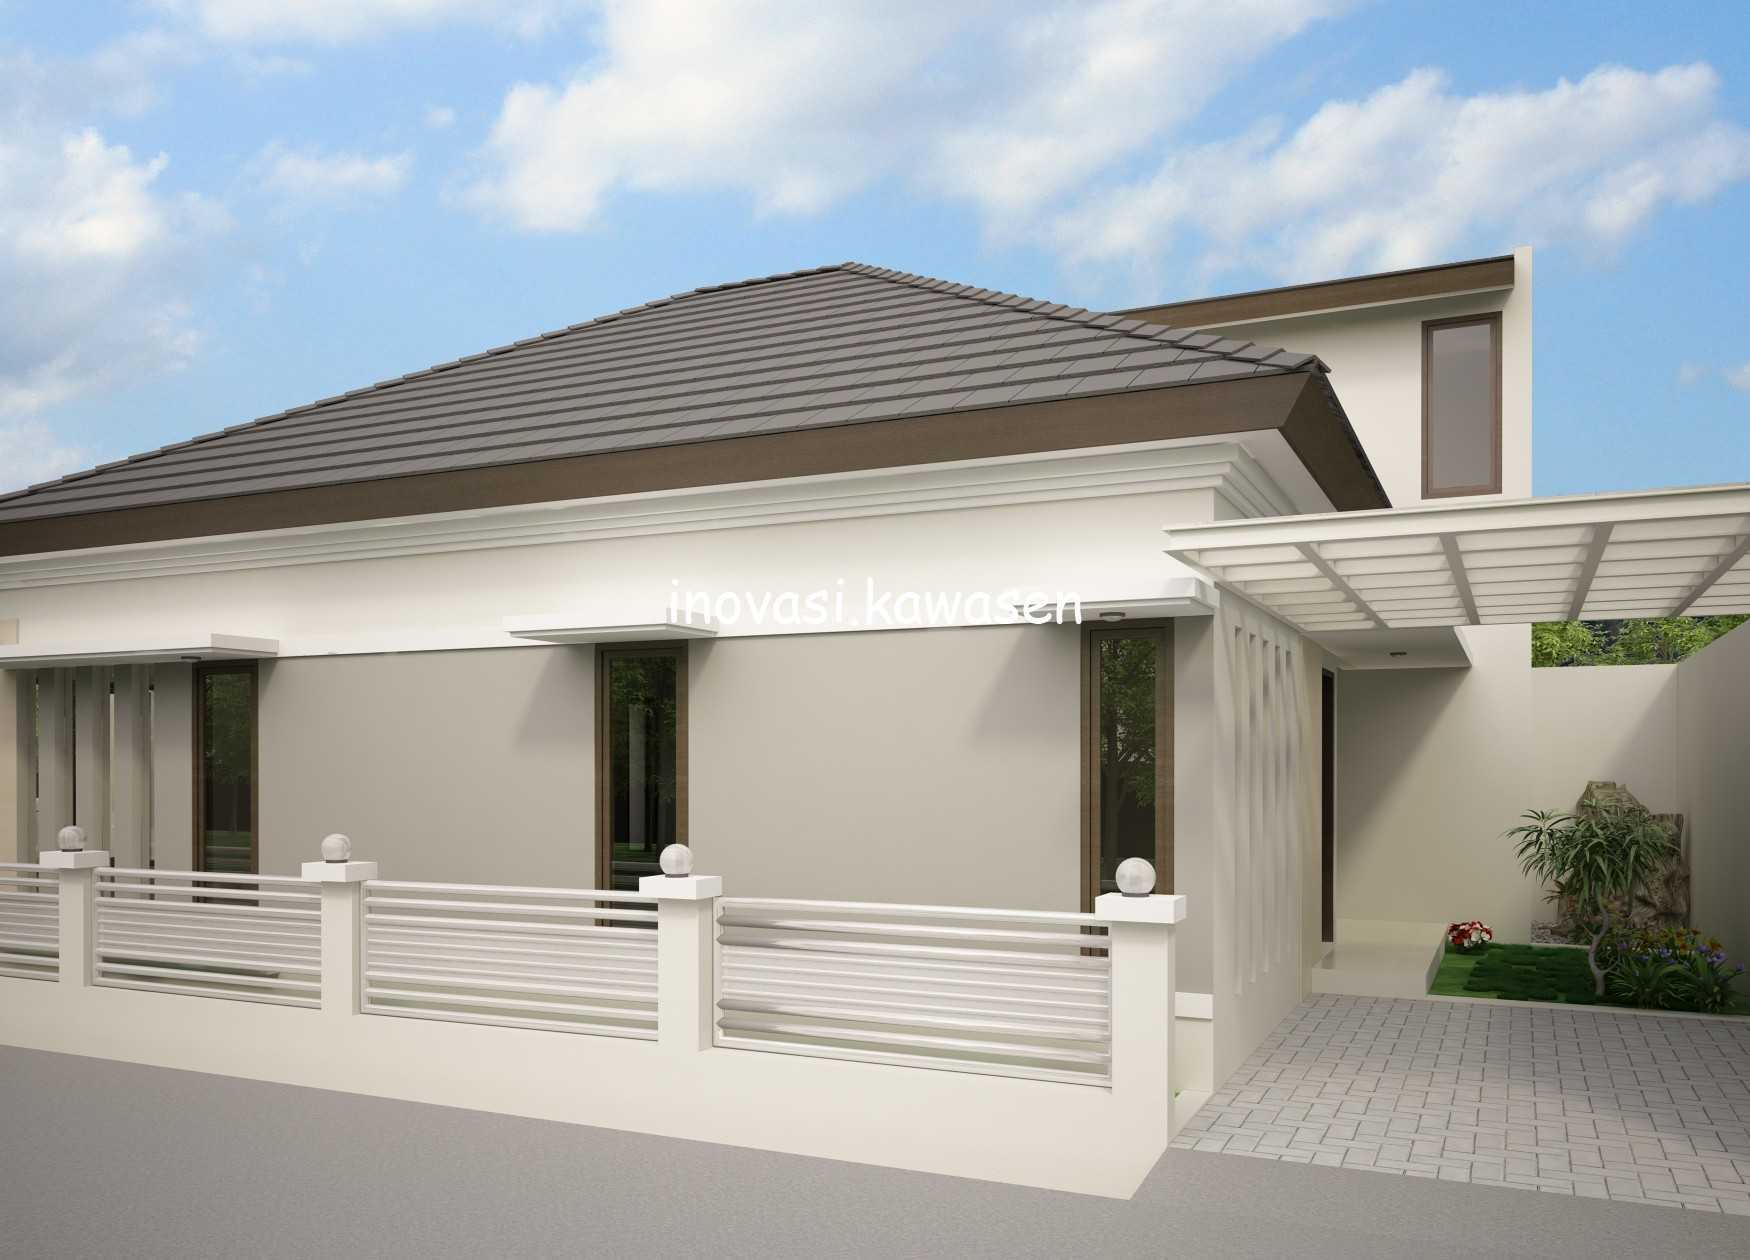 Inovasi Kawasen Desain Rumah Tinggal - Depok 2015 Depok, Kota Depok, Jawa Barat, Indonesia Depok, Kota Depok, Jawa Barat, Indonesia Inovasikawasen-Desain-Rumah-Tinggal-Depok-2015  89449